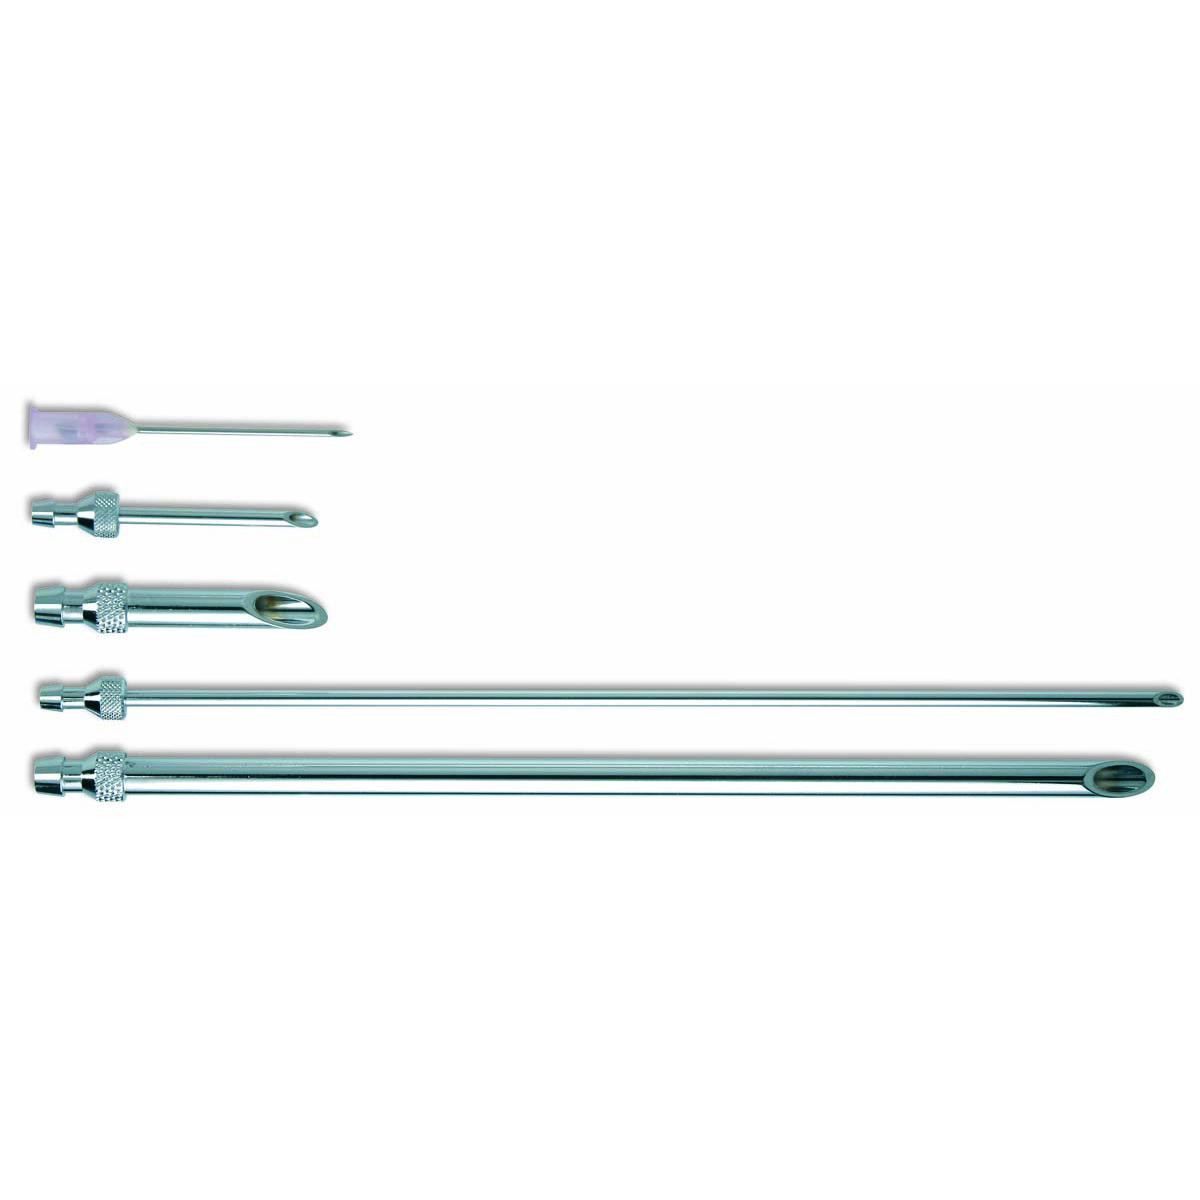 SOCOREX® DOSYS™ Syringe Short Vent Cannulas, Chrome Plated, 10 mL